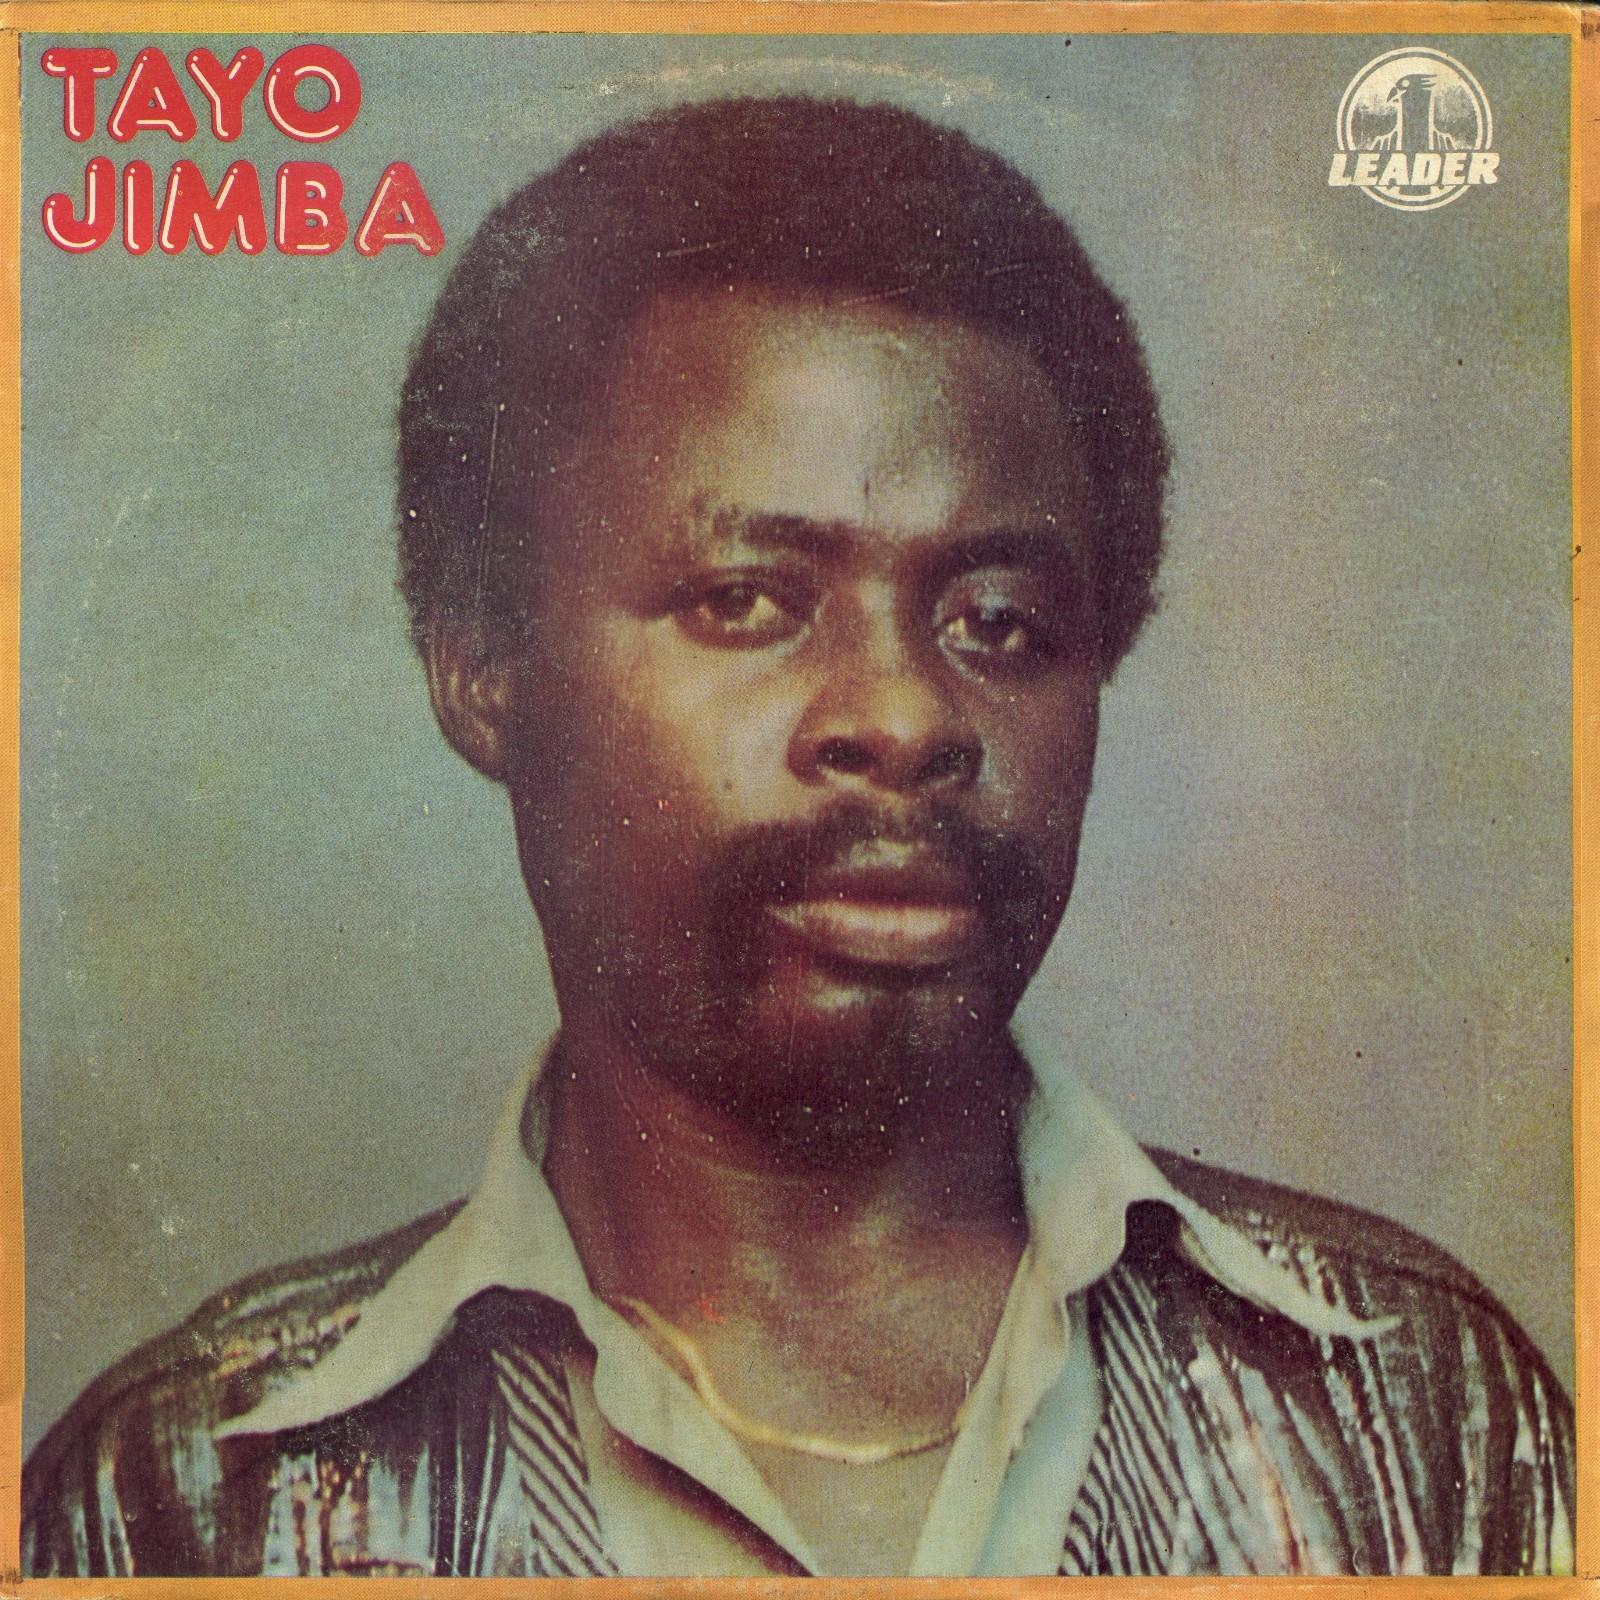 Tayo Jimba & his Black Shadows – Ise Aje : 70s NIGERIAN Highlife Funk Juju Music ALBUM LP